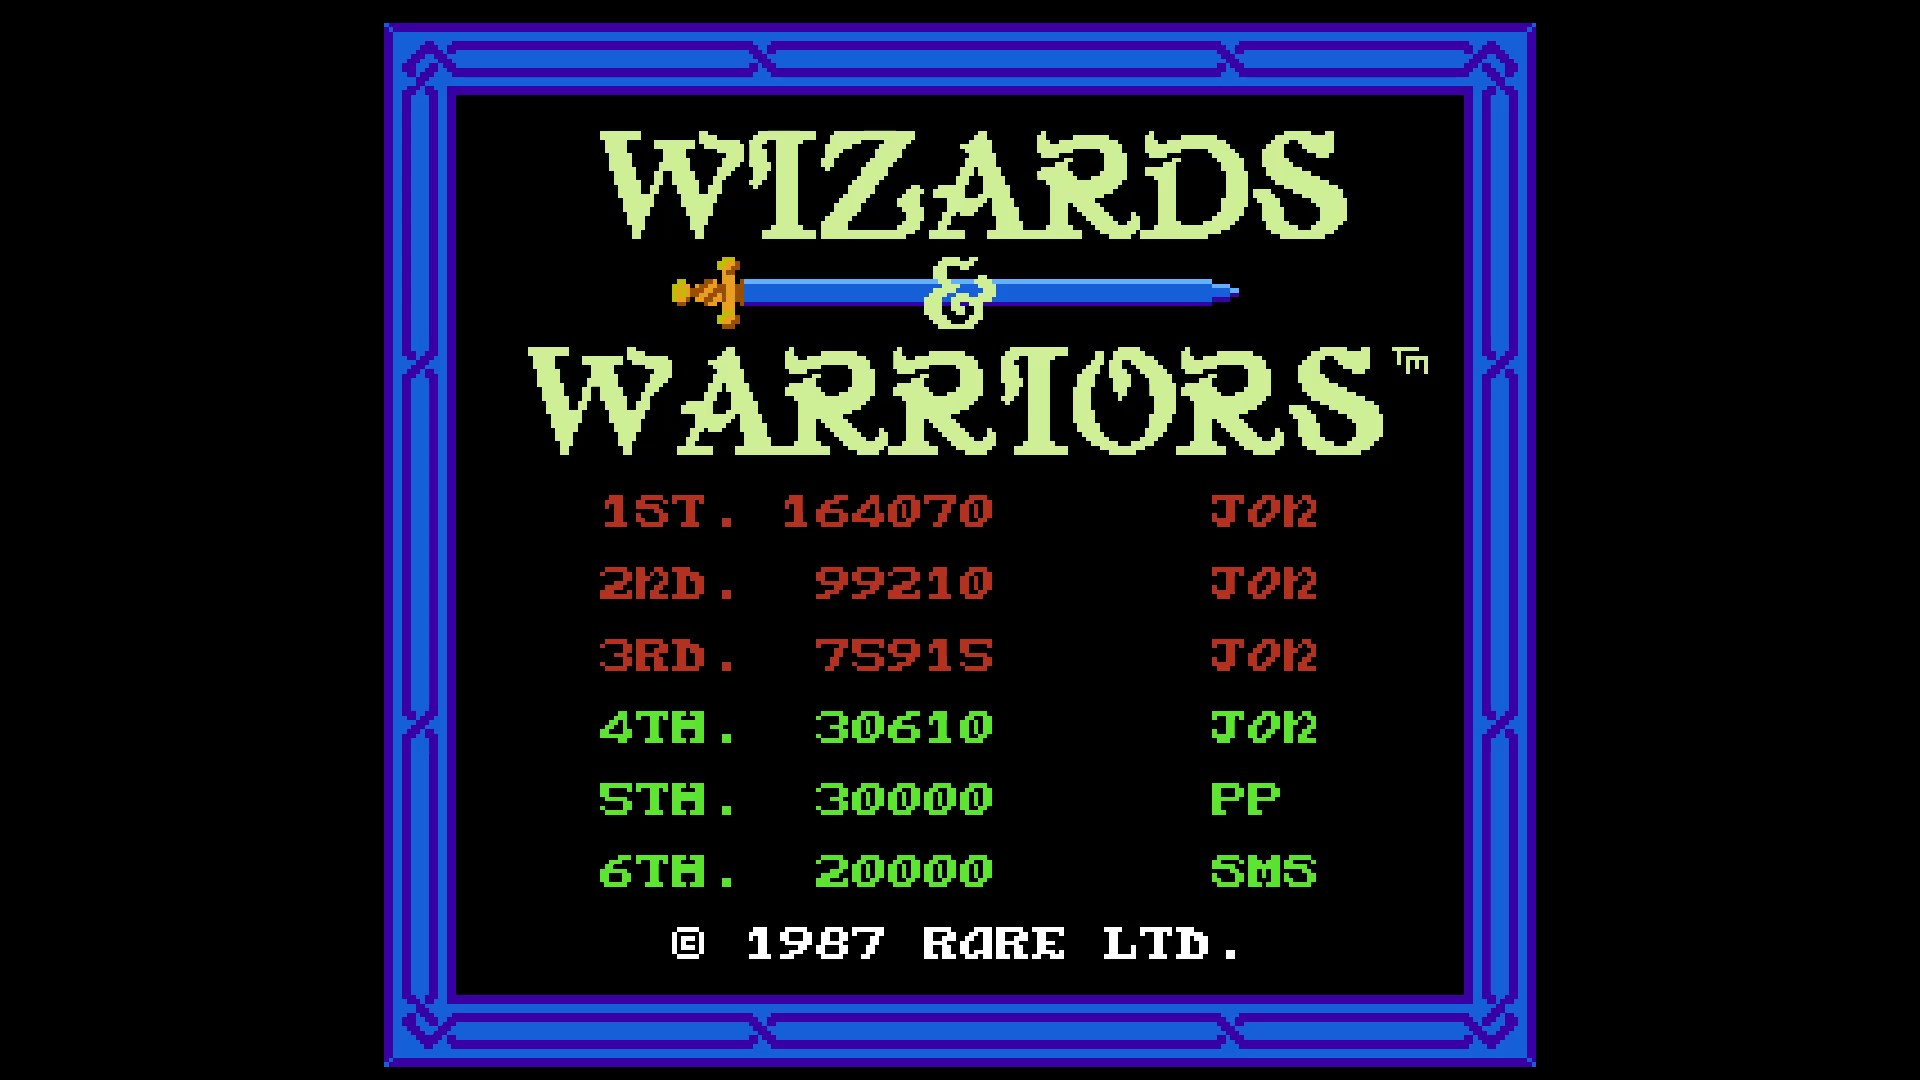 AkinNahtanoj: Wizards & Warriors (NES/Famicom Emulated) 164,070 points on 2020-09-28 16:07:30